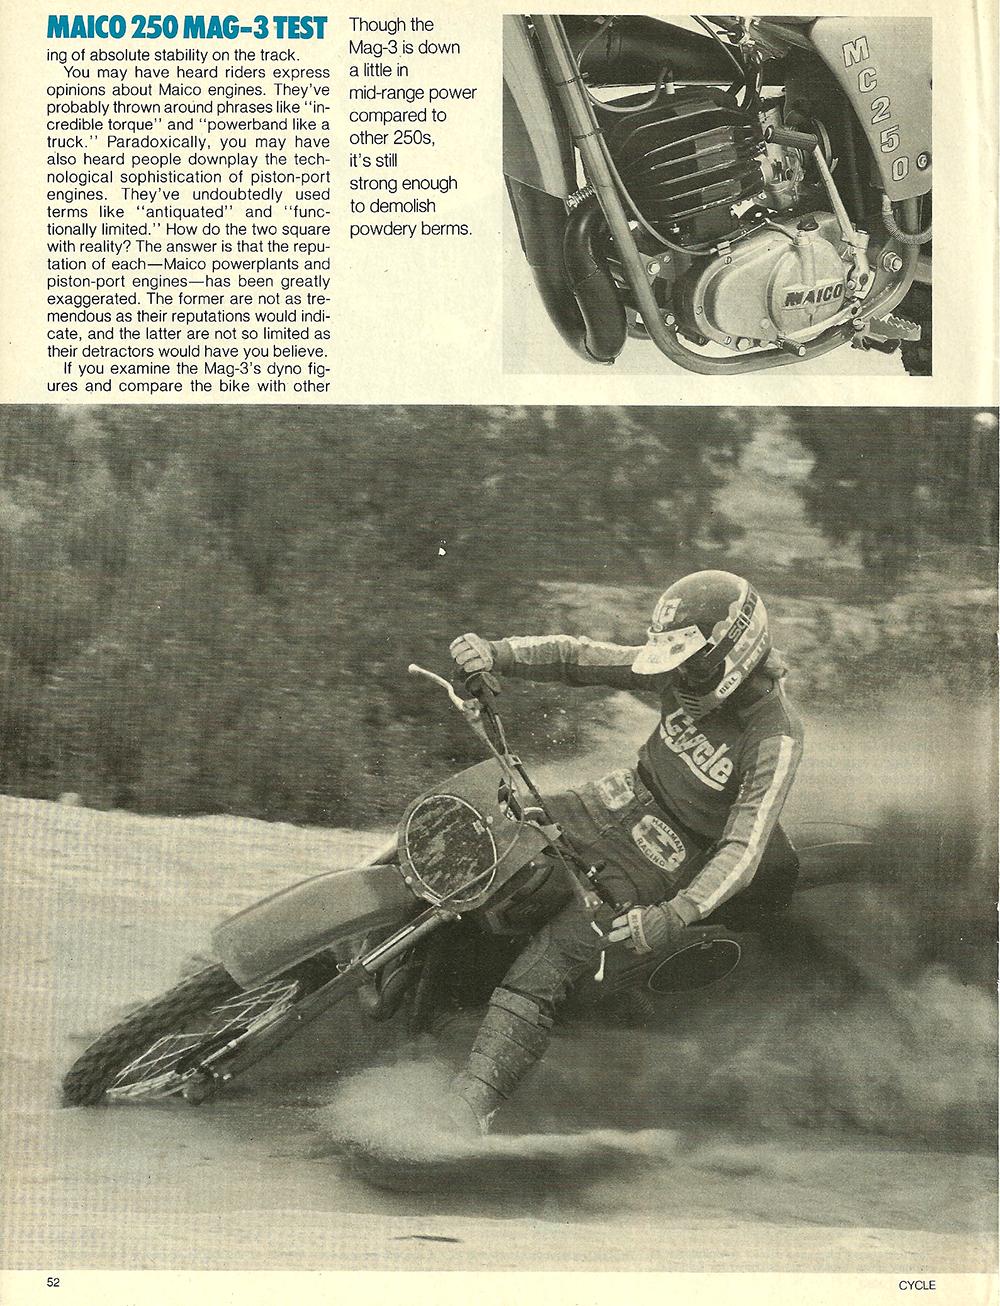 1980 Maico 250 Mag-3 road test 5.jpg